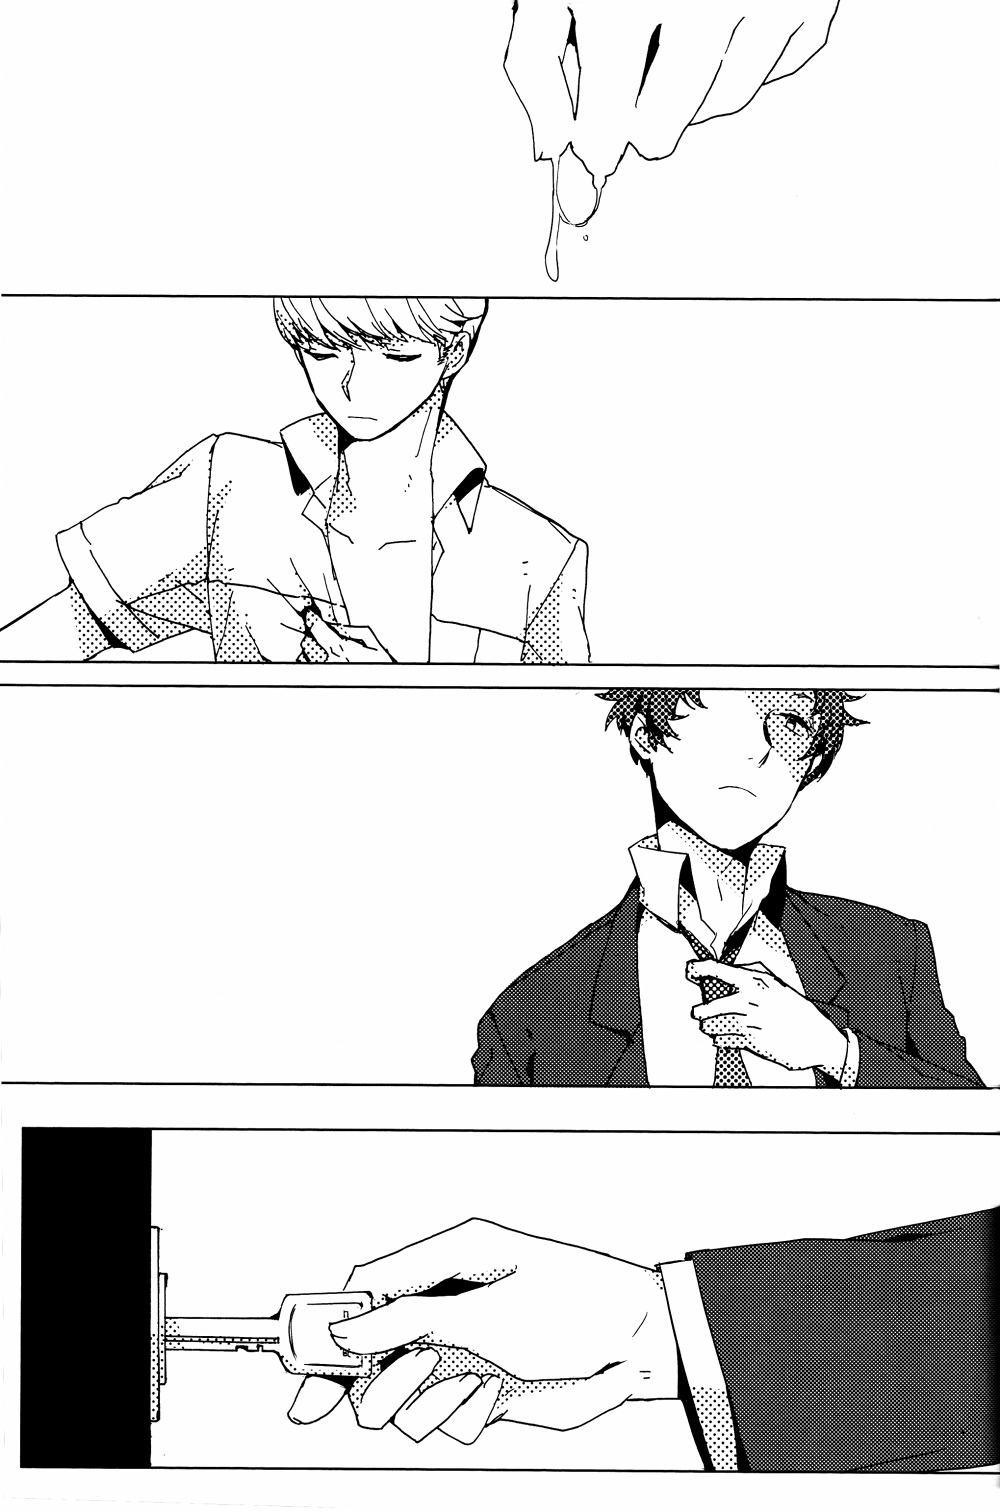 Trang 9 - Chia Sẻ Sự Tĩnh Lặng (- HEART STATION (Ebisushi)) - Truyện tranh Gay - Server HostedOnGoogleServerStaging